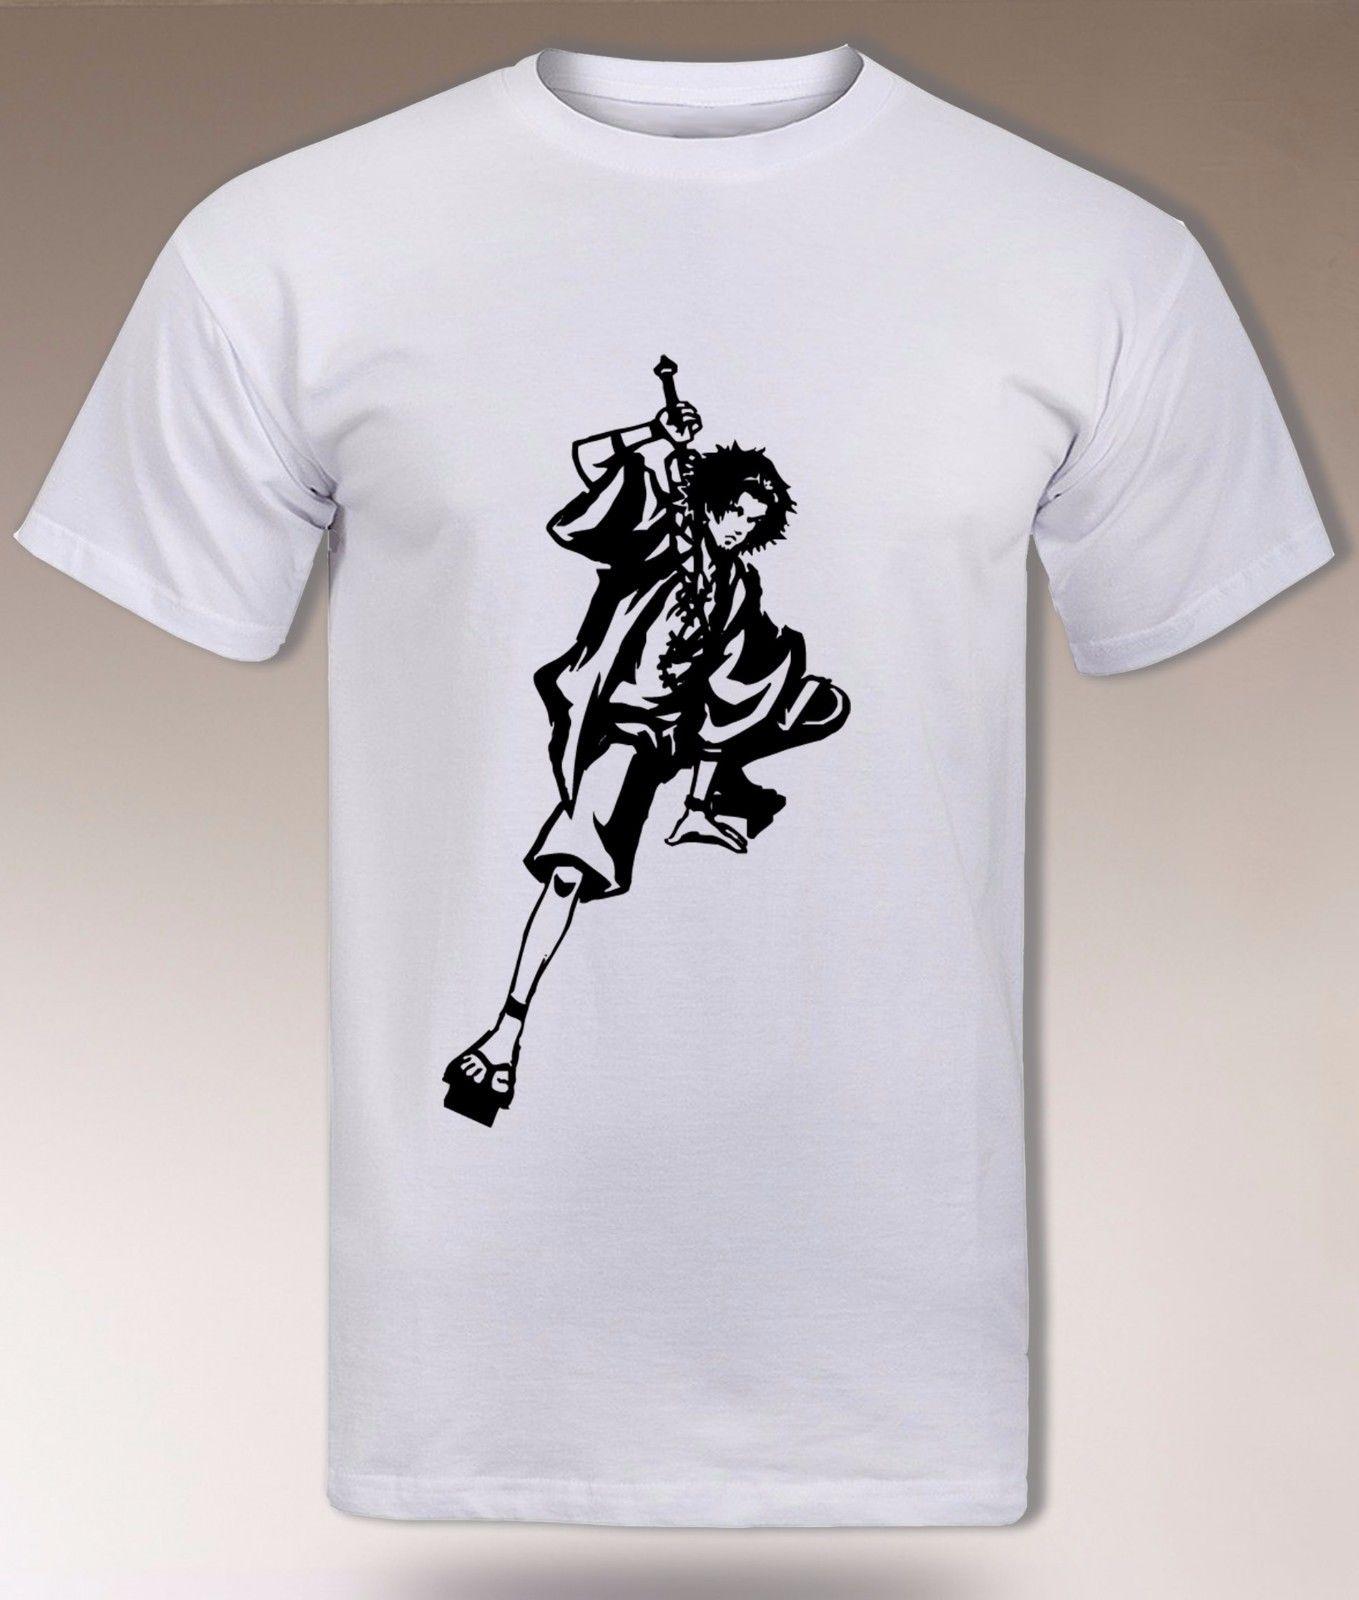 Samurai Champloo Mugen T Shirt, Jin Fuu, Edo era, Cool Anime Vagabond tee Men 100% Cotton Fashion T-Shirts top tee